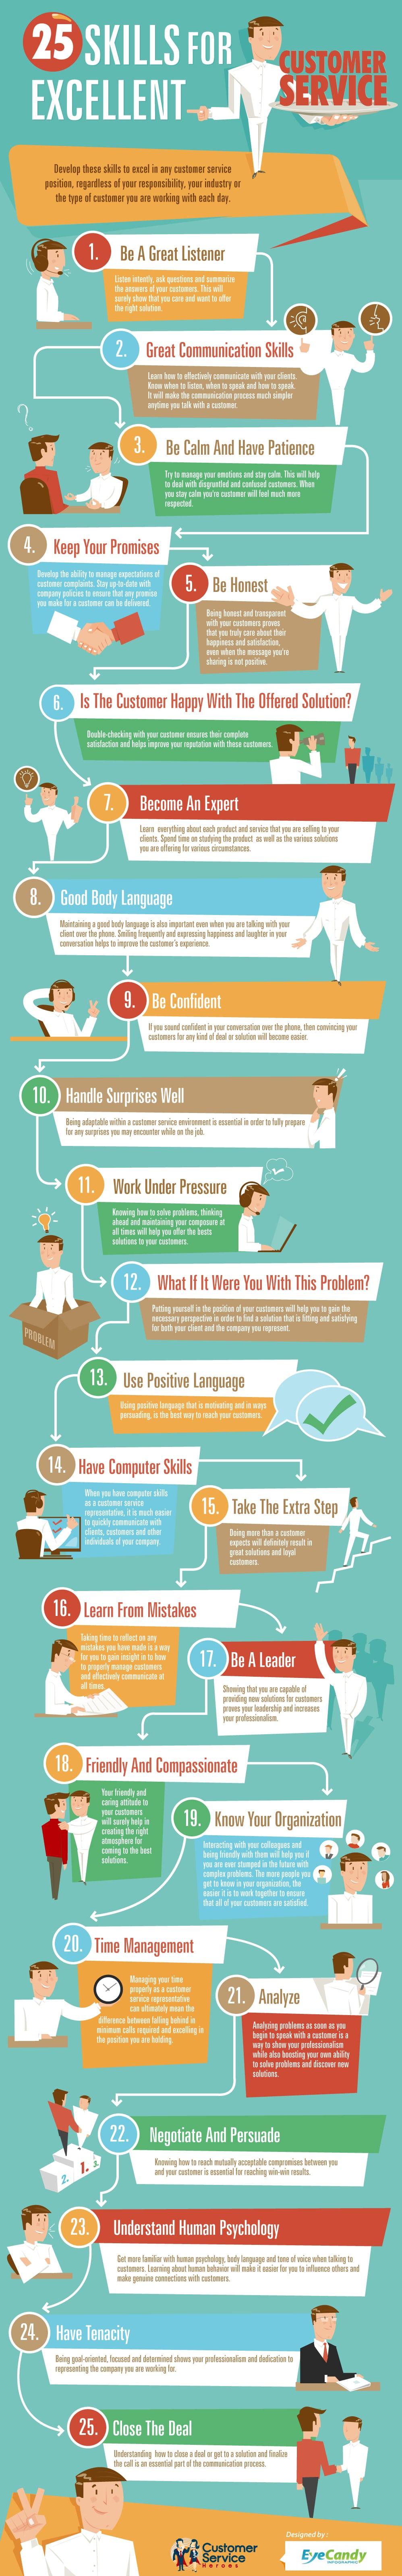 customer-service-skills-needed-infographic